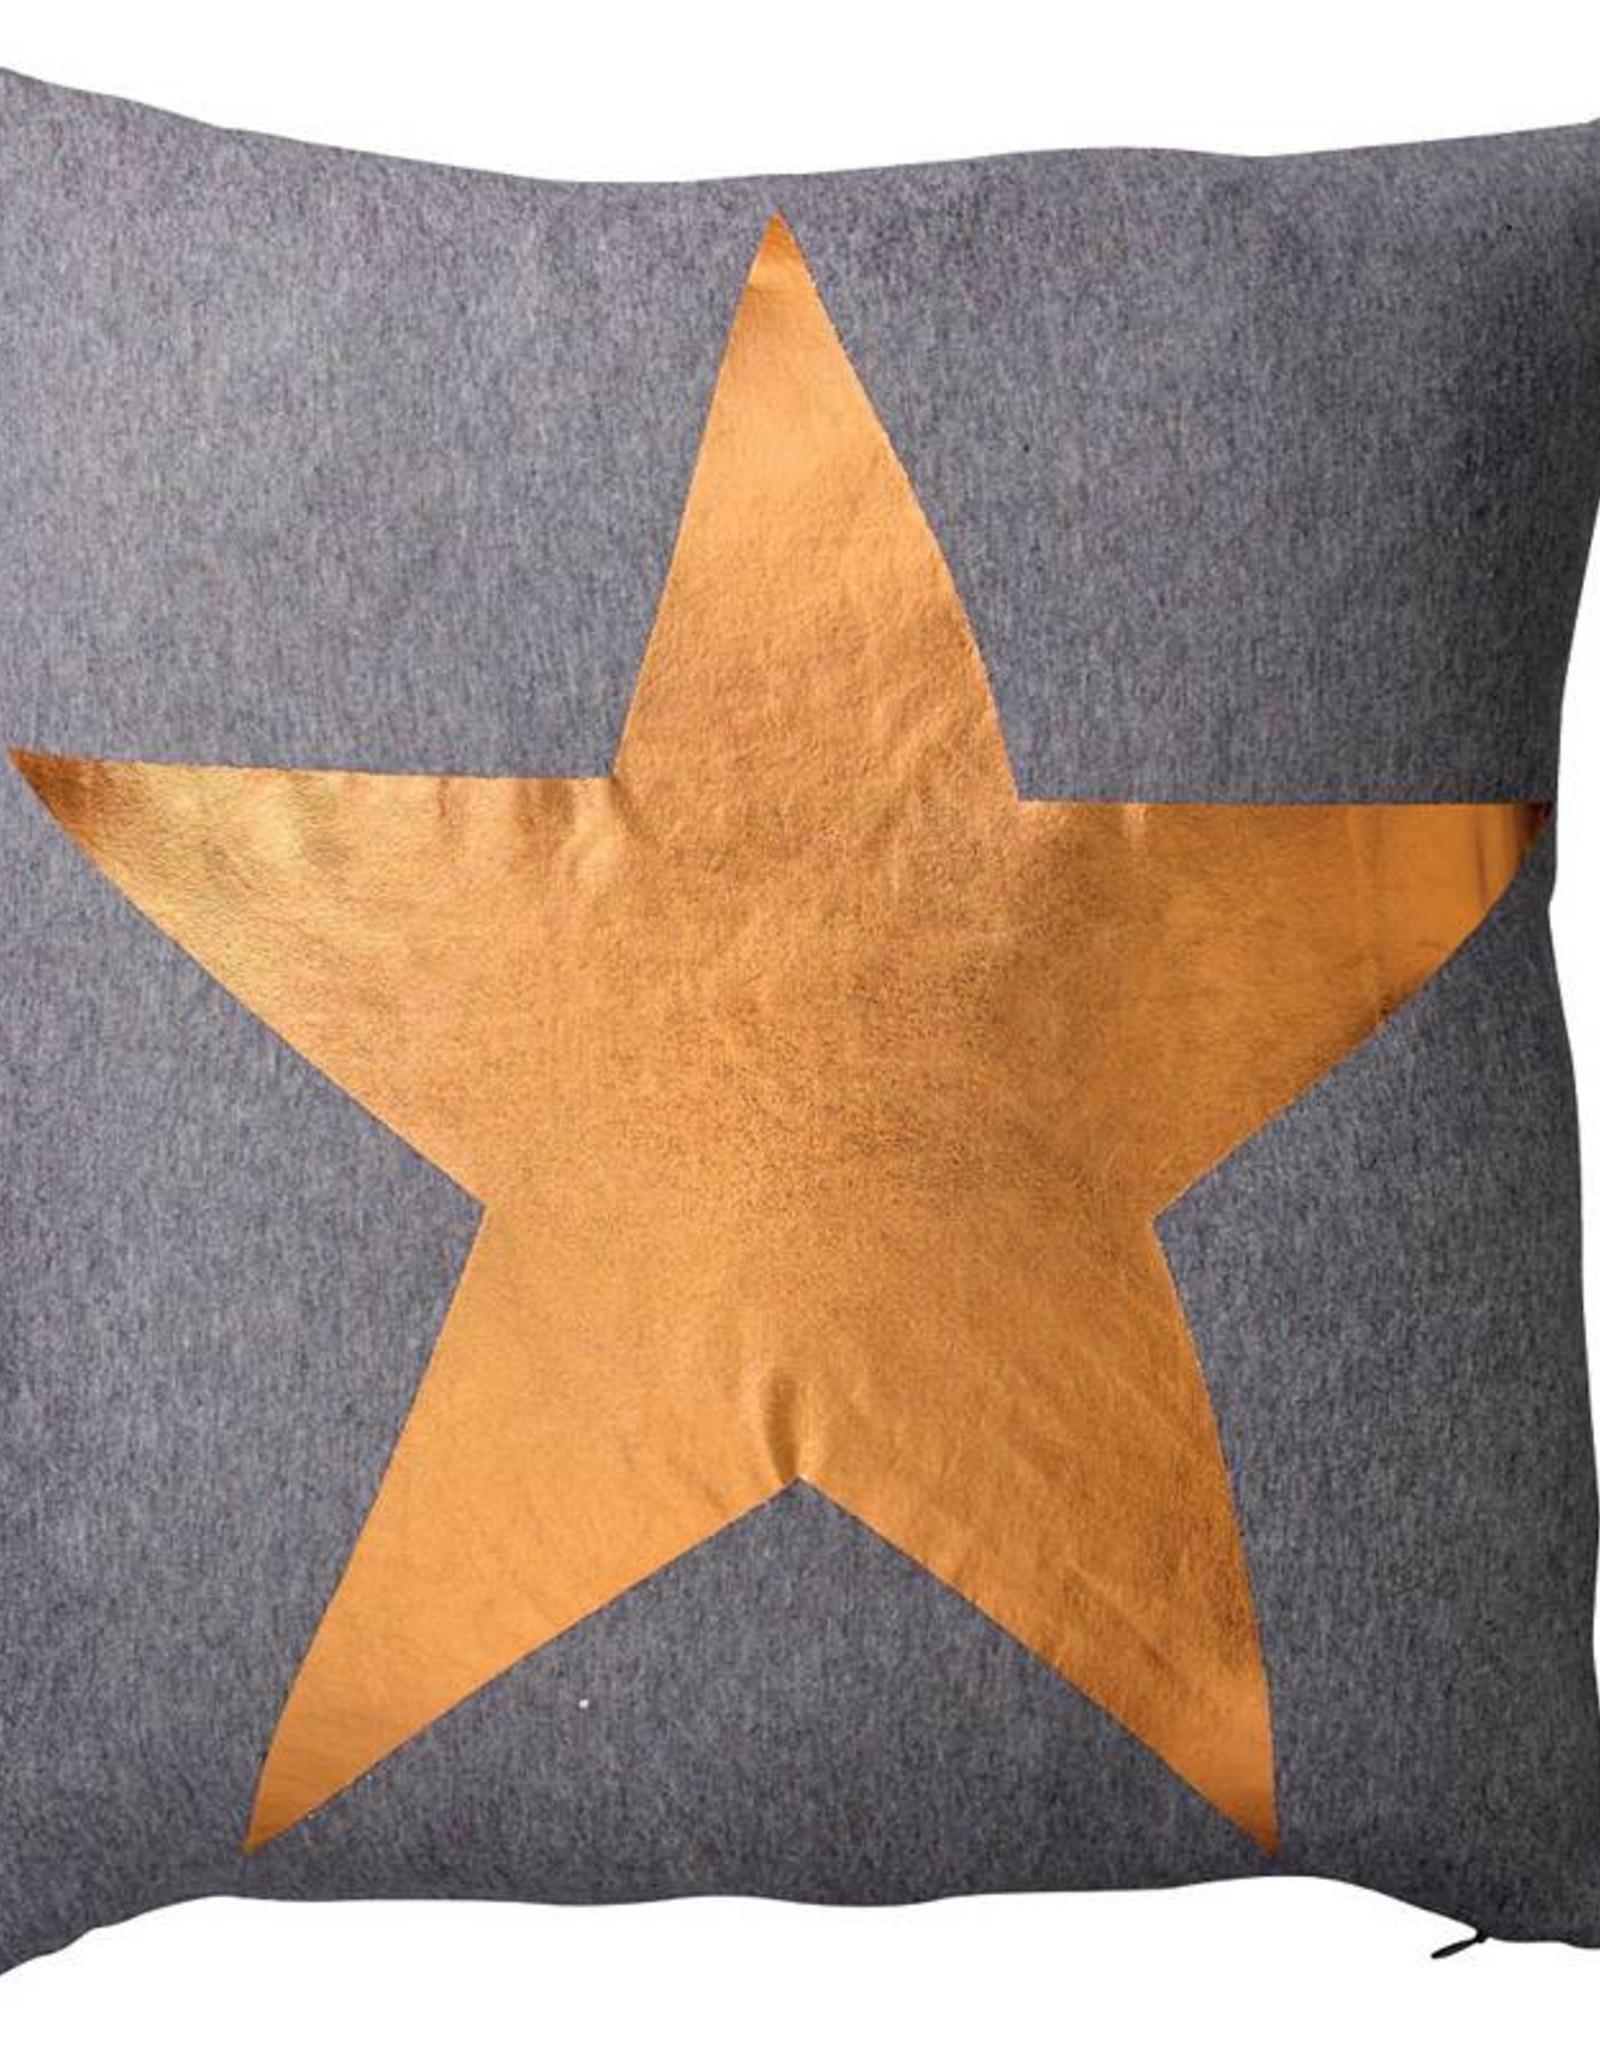 Dark Grey Melange Pillow with Copper Star